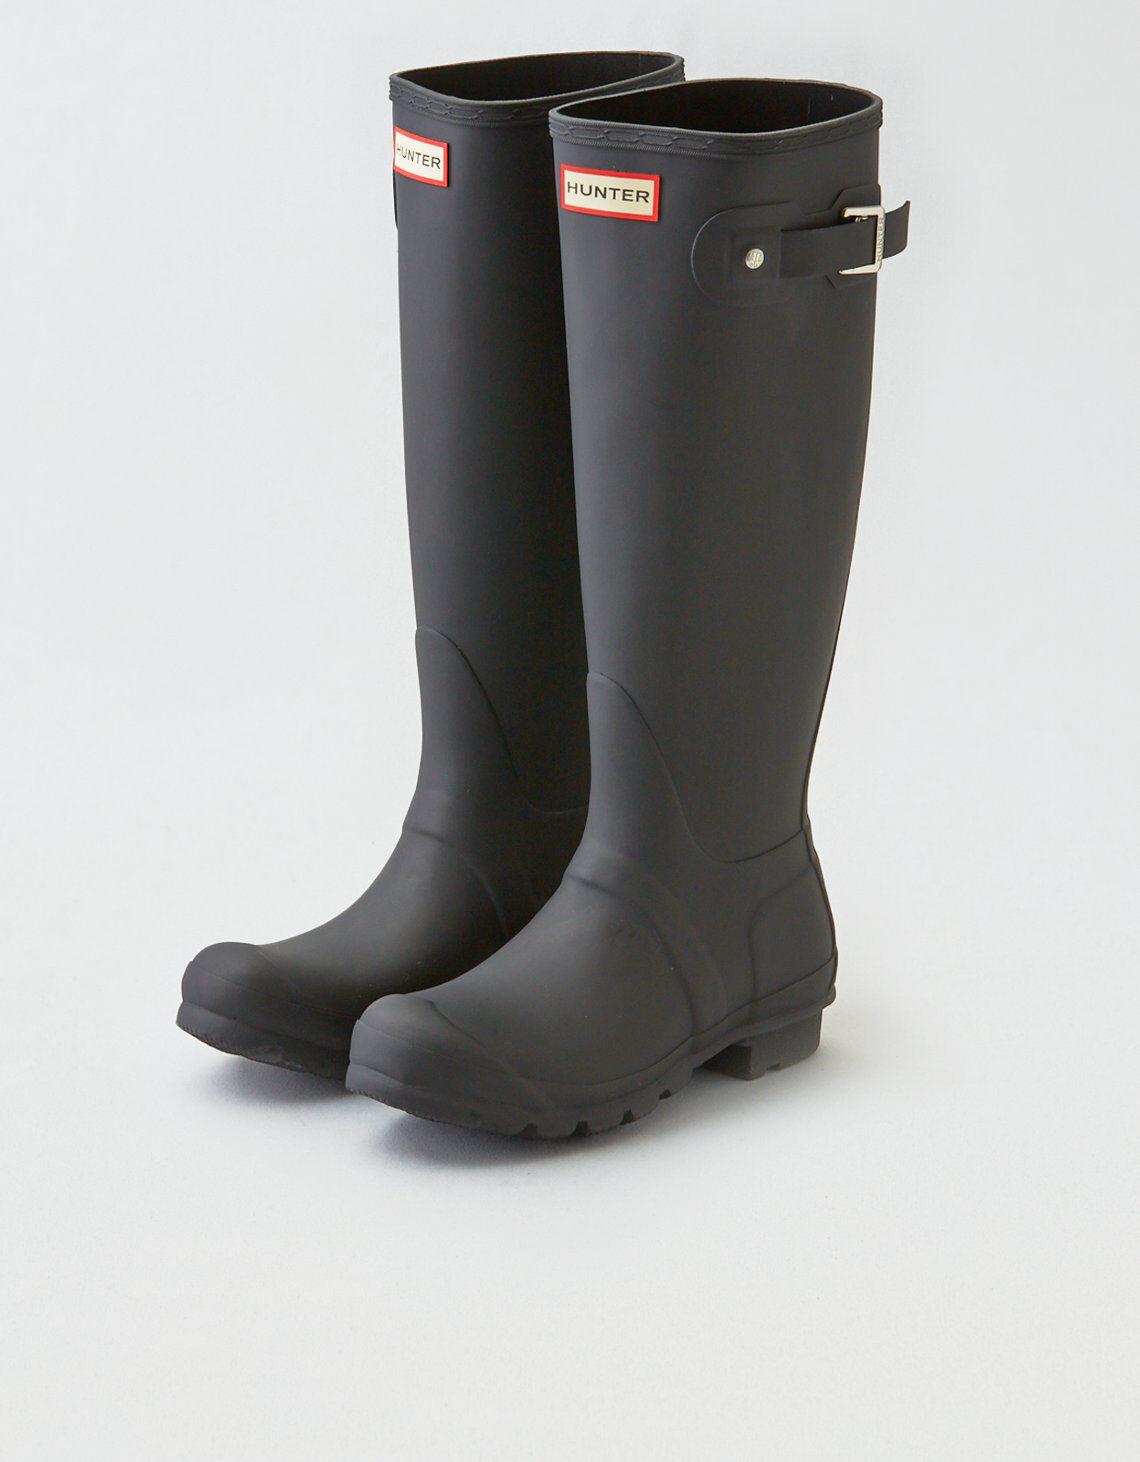 Hunter Original Tall Rain Boots Black Matte Size 11